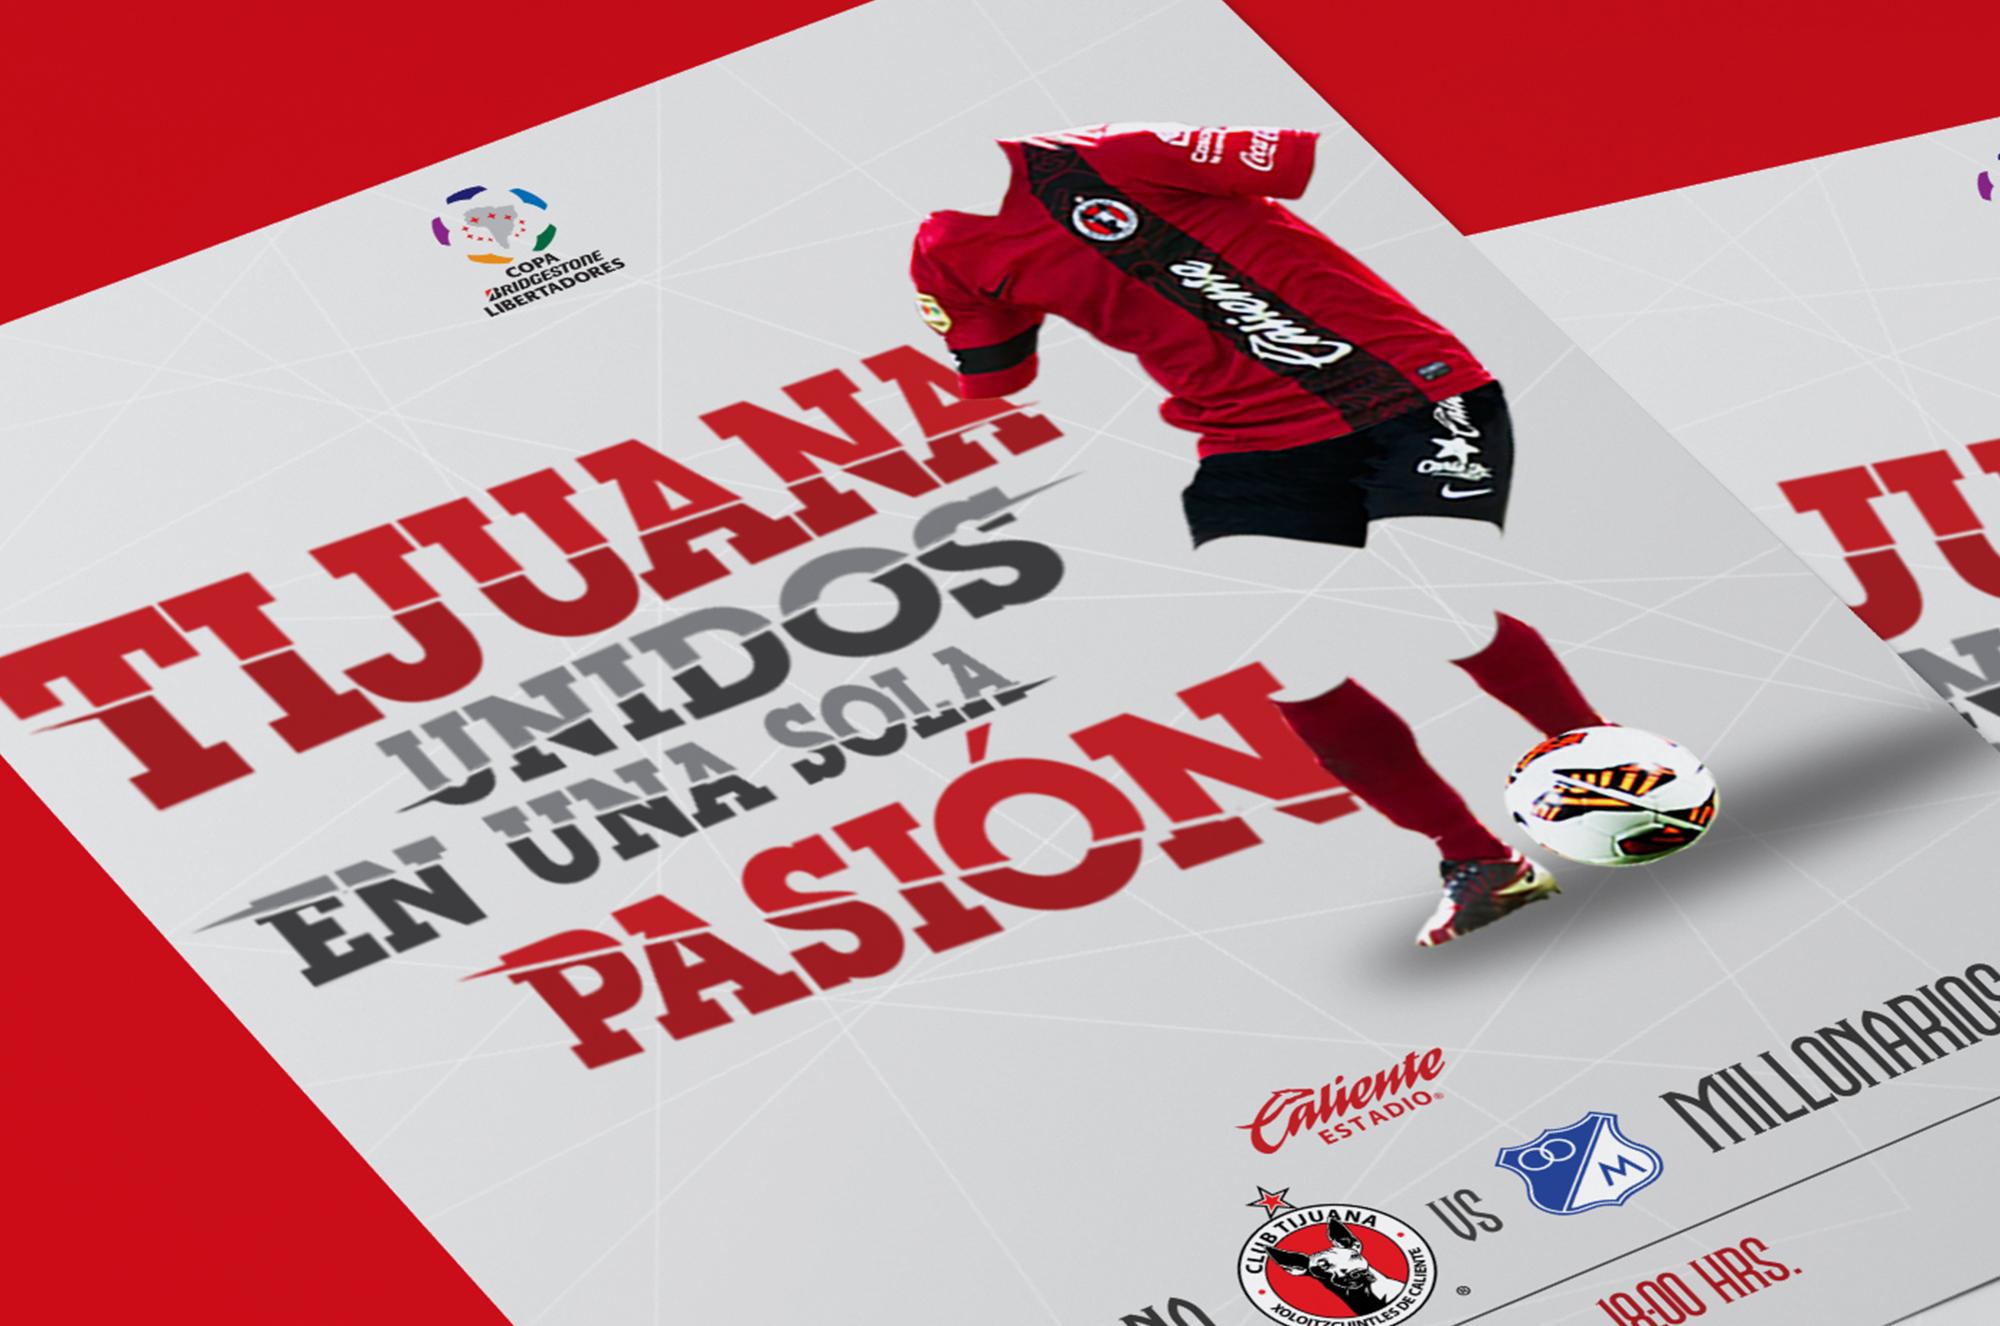 raniev-rod-alvarez-diseño-gráfico-queretaro-club-tijuana-5-vs-millonarios